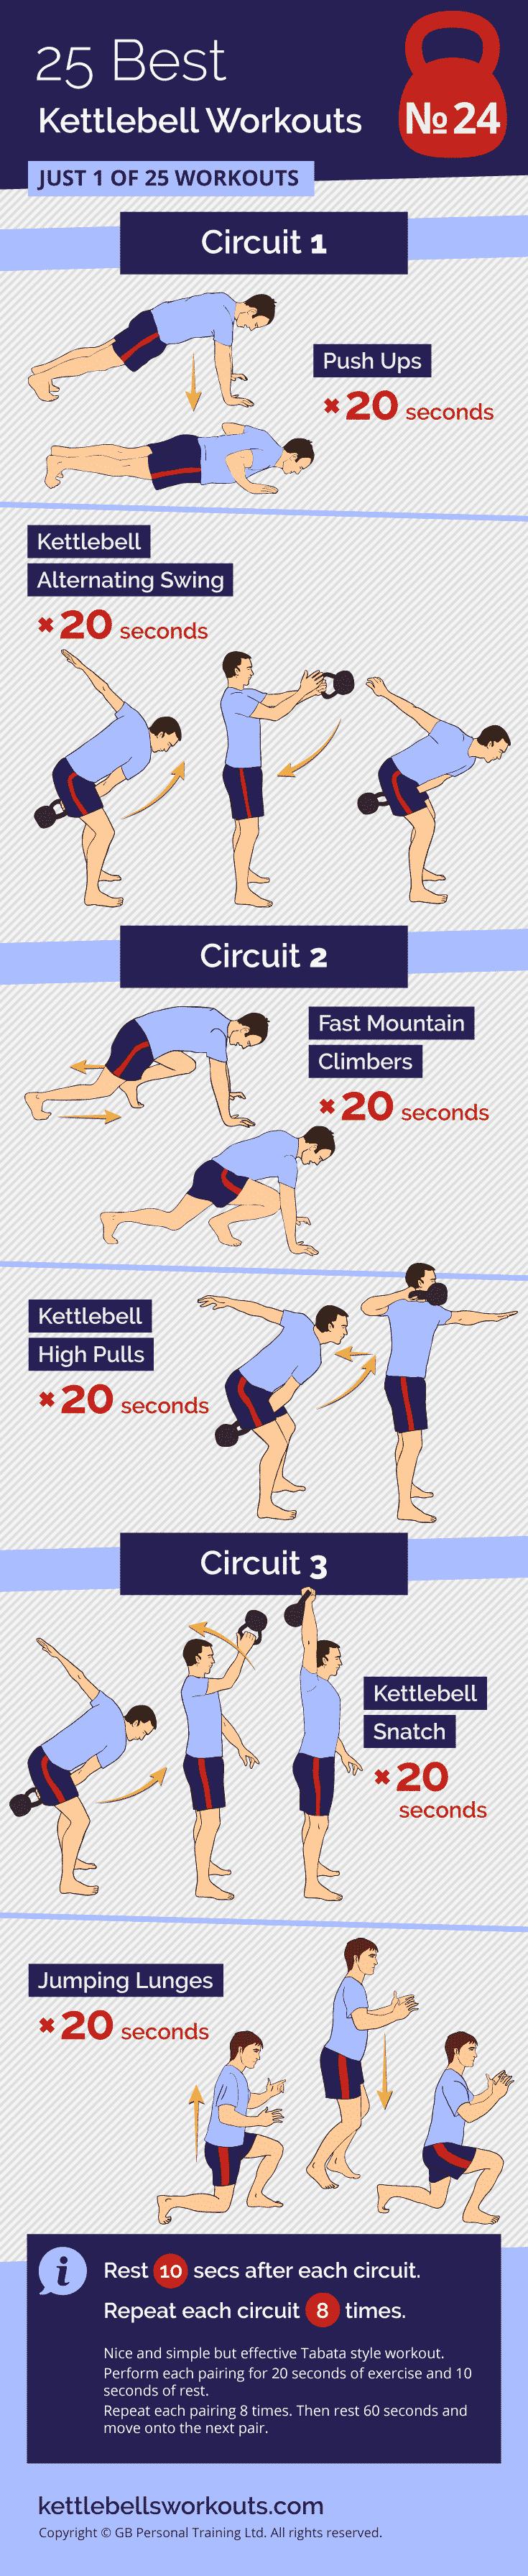 Tabata Time Kettlebell Workout